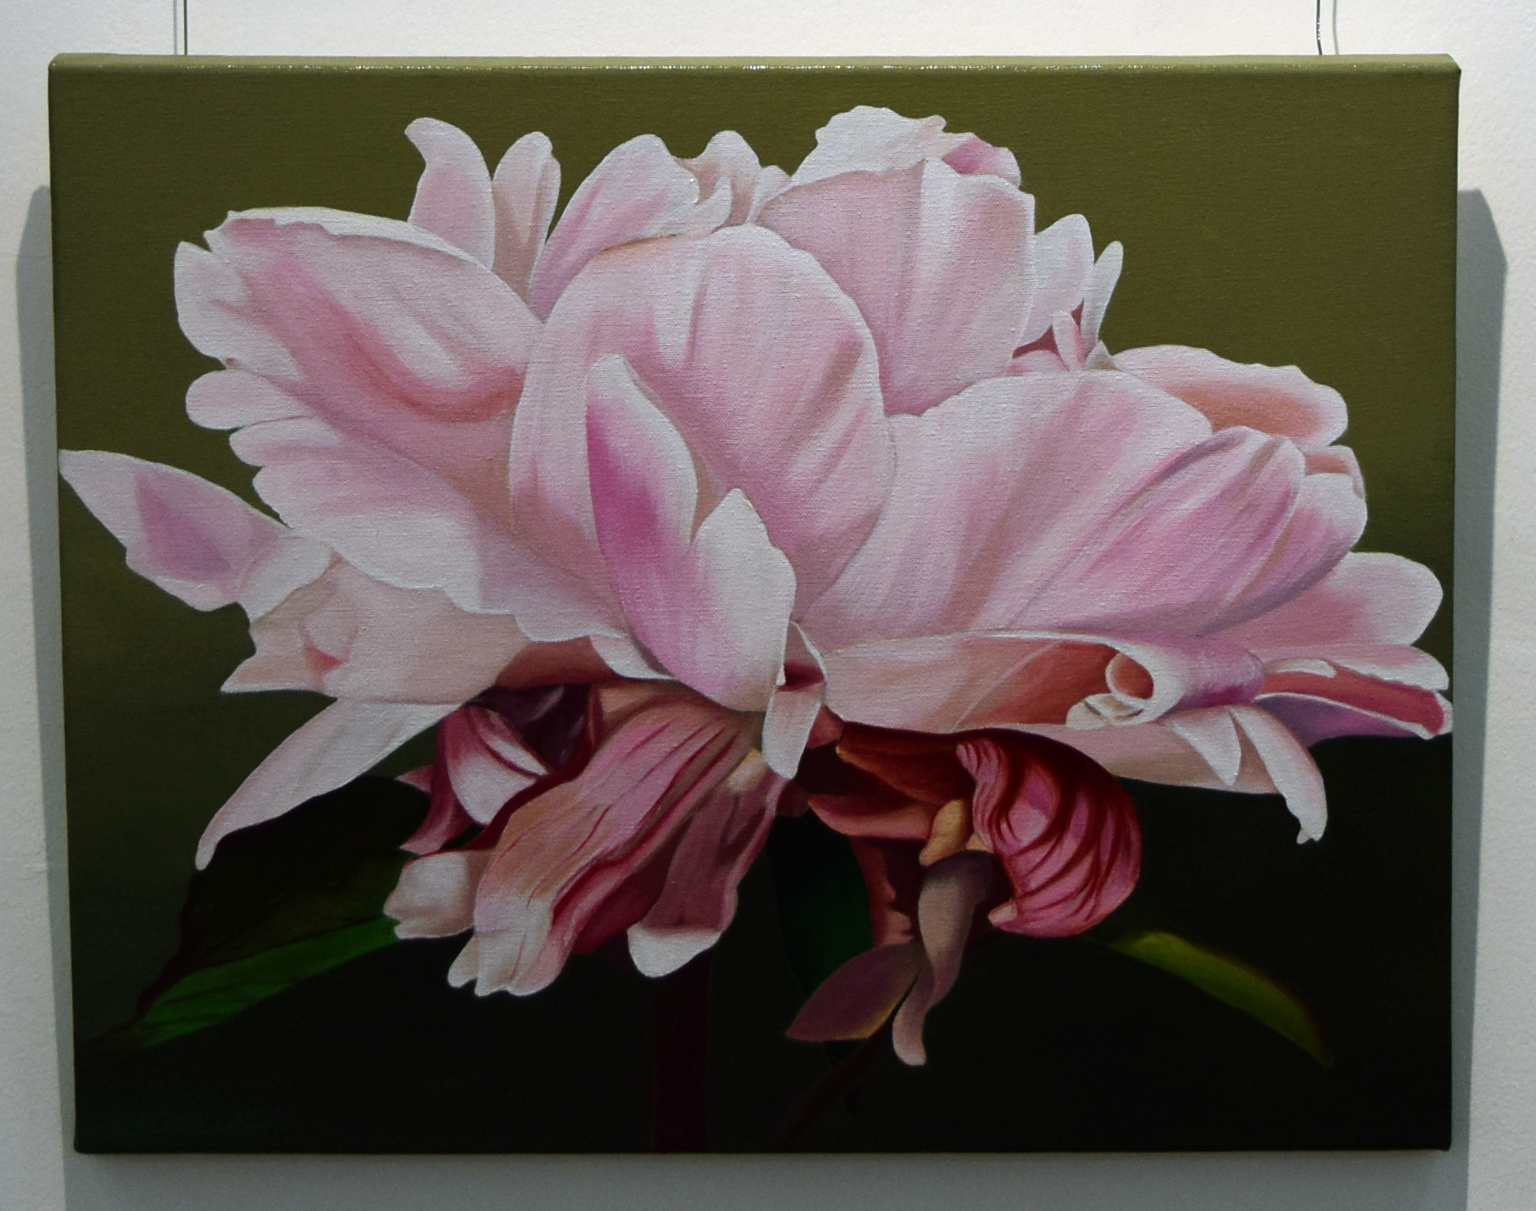 8. Pat Hillard, Peony II, 2018, acrylic on canvas, 50 x 40 cm, $480